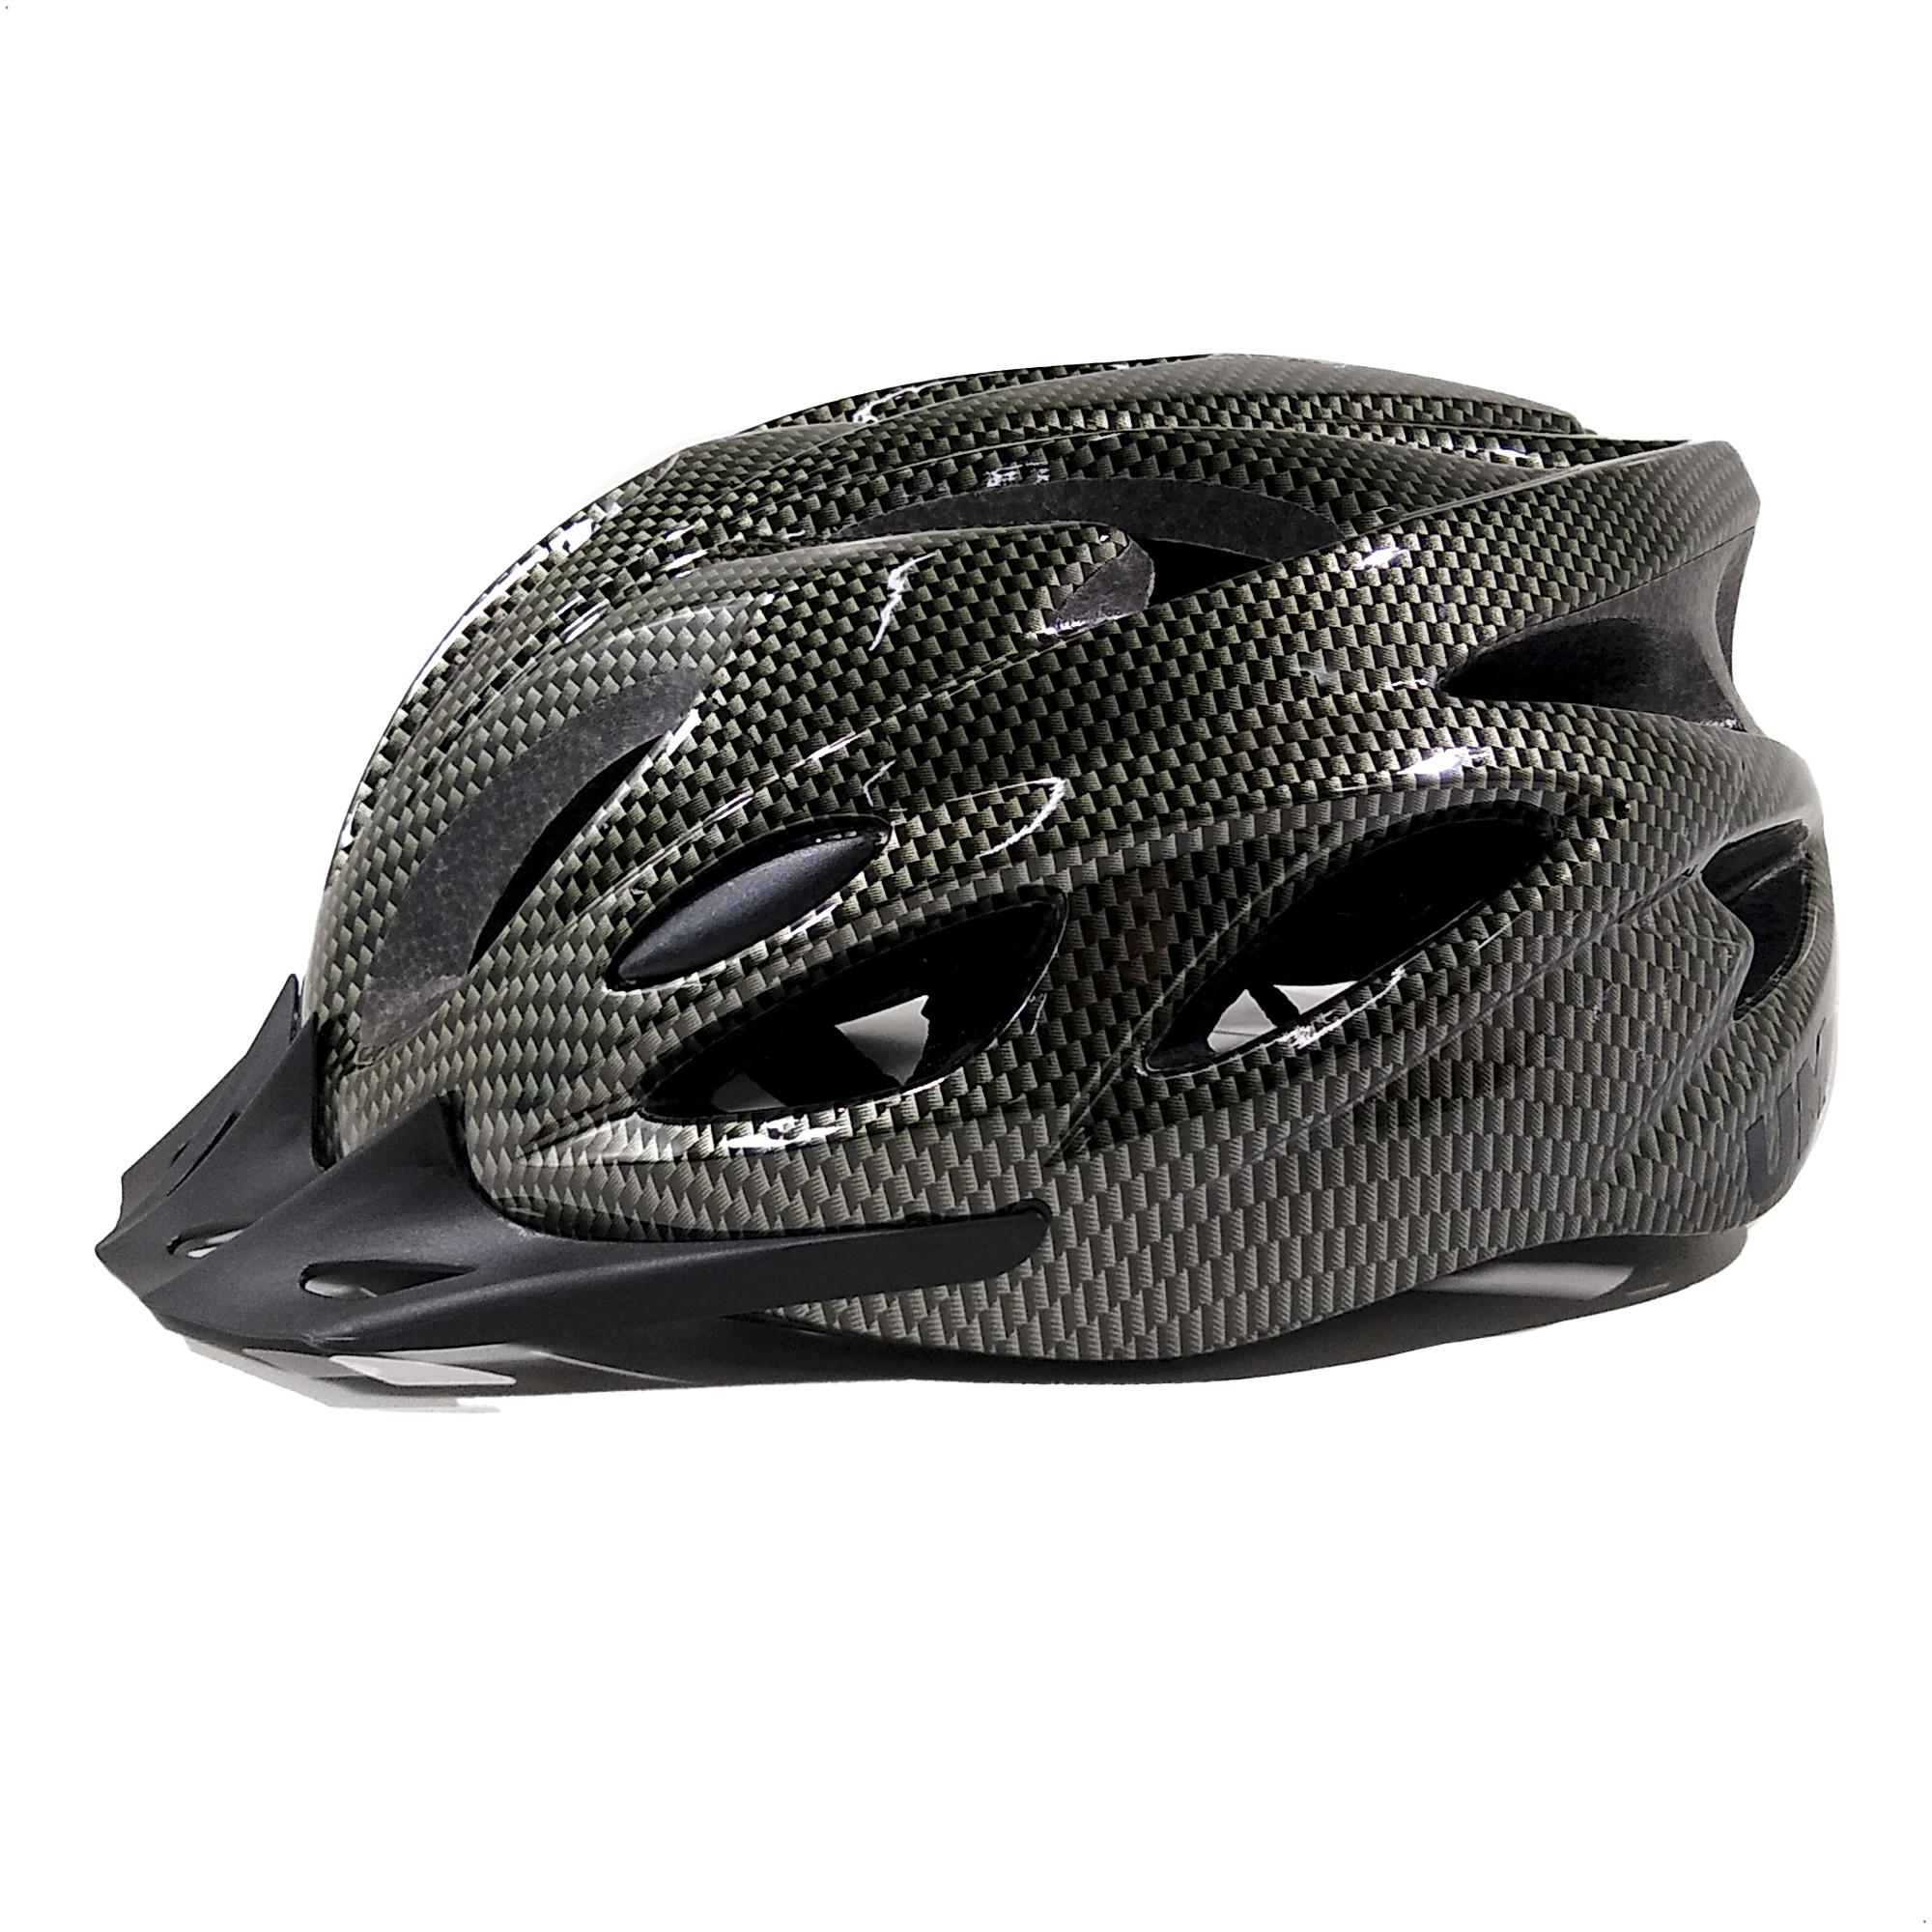 Casco Mtb Bicicleta Con Visera Regulable Ventilaciones